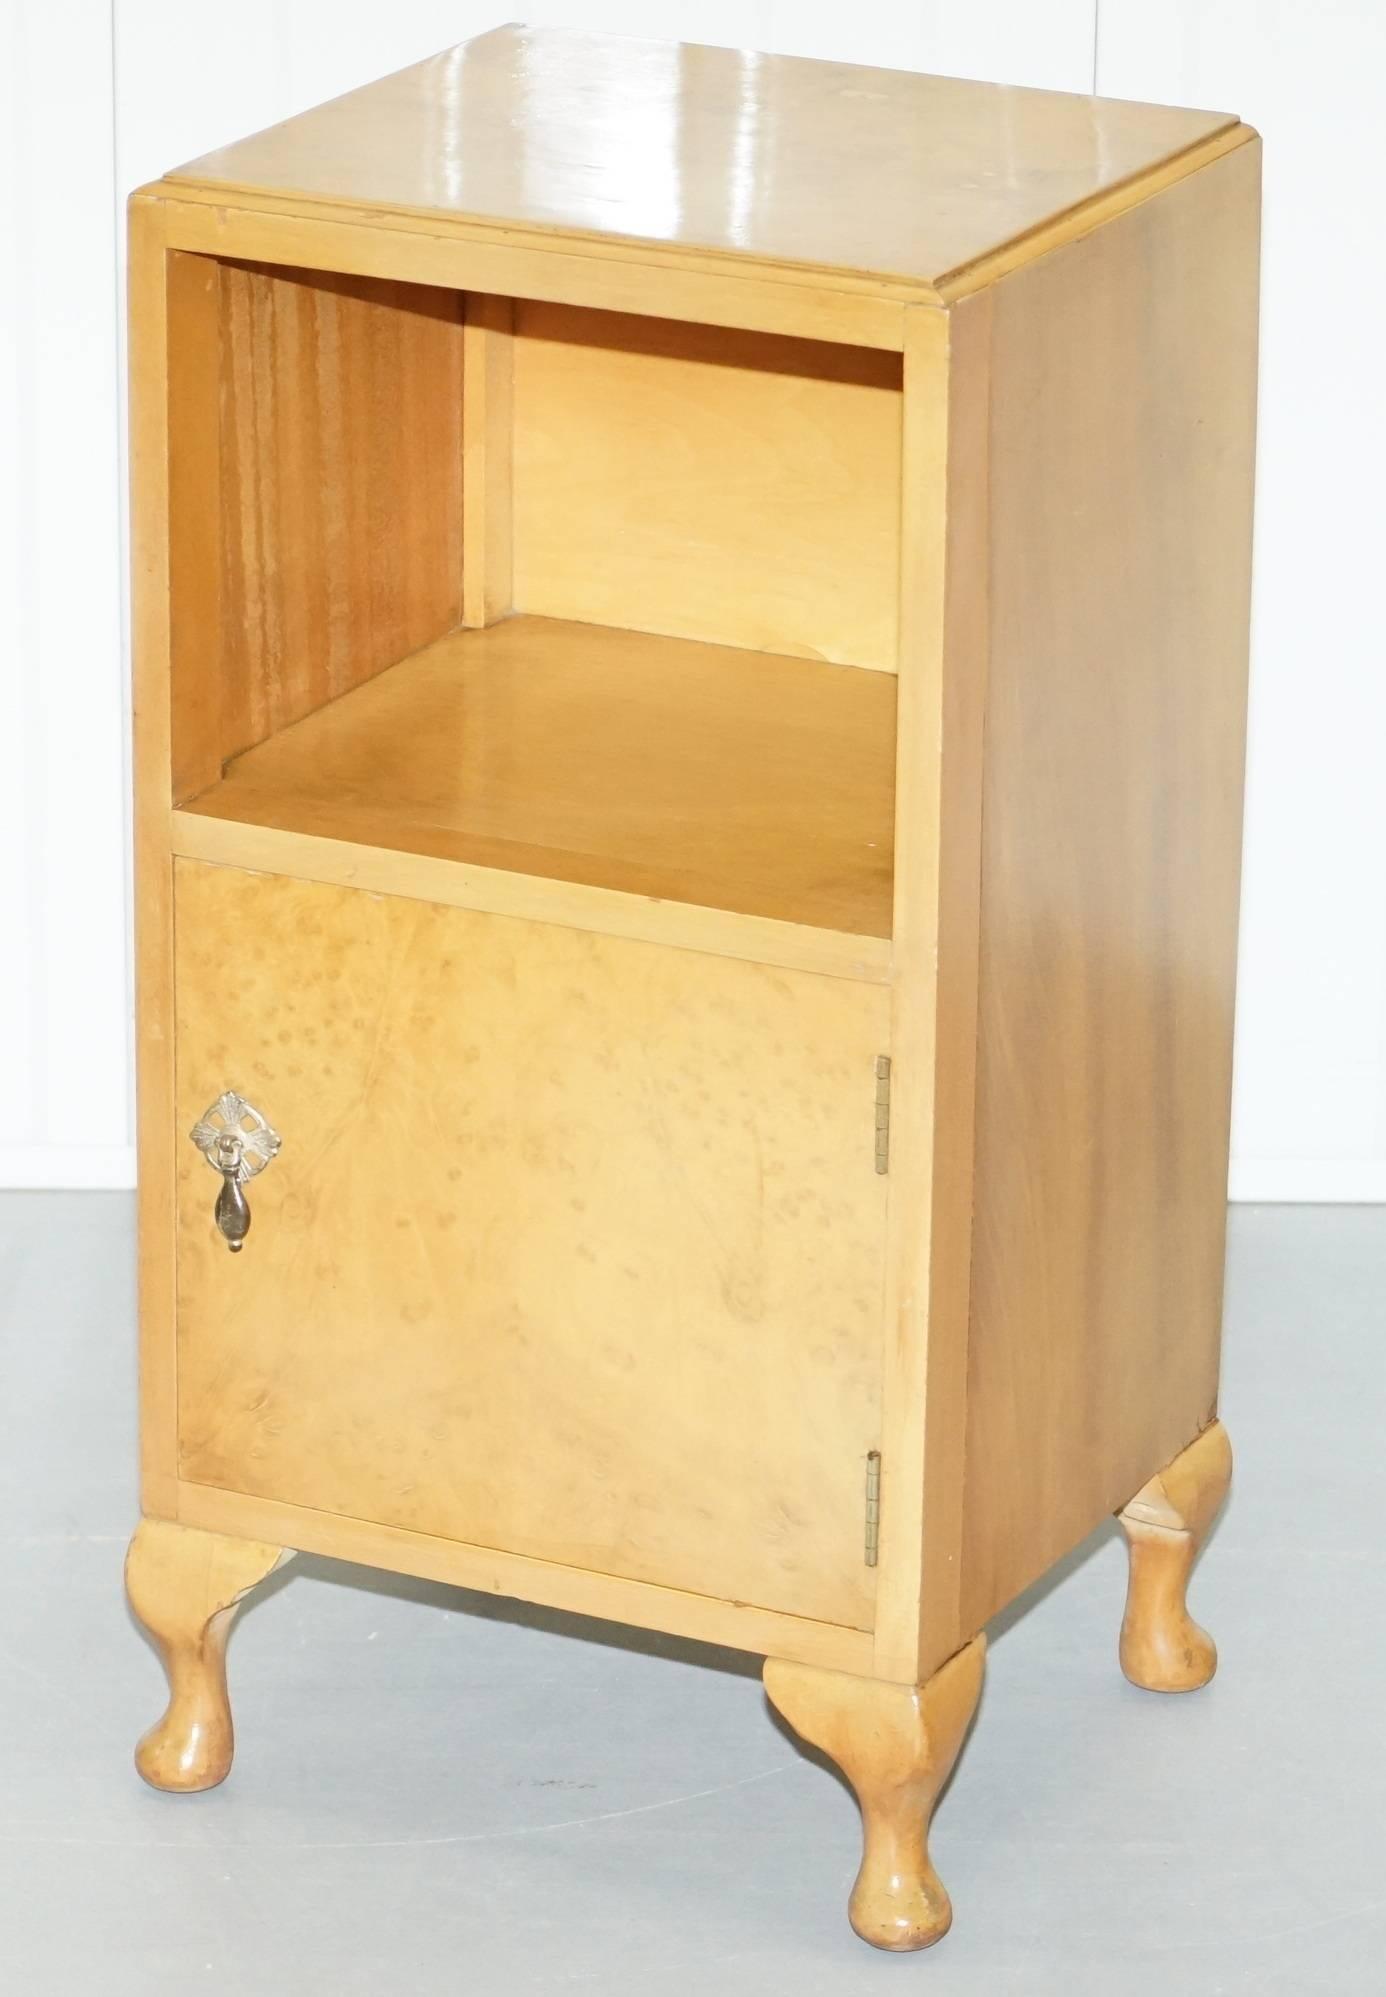 Art Deco Heirloom Furniture Est 1889 Burr Walnut Bedside Table Cabinet With  Cupboard For Sale